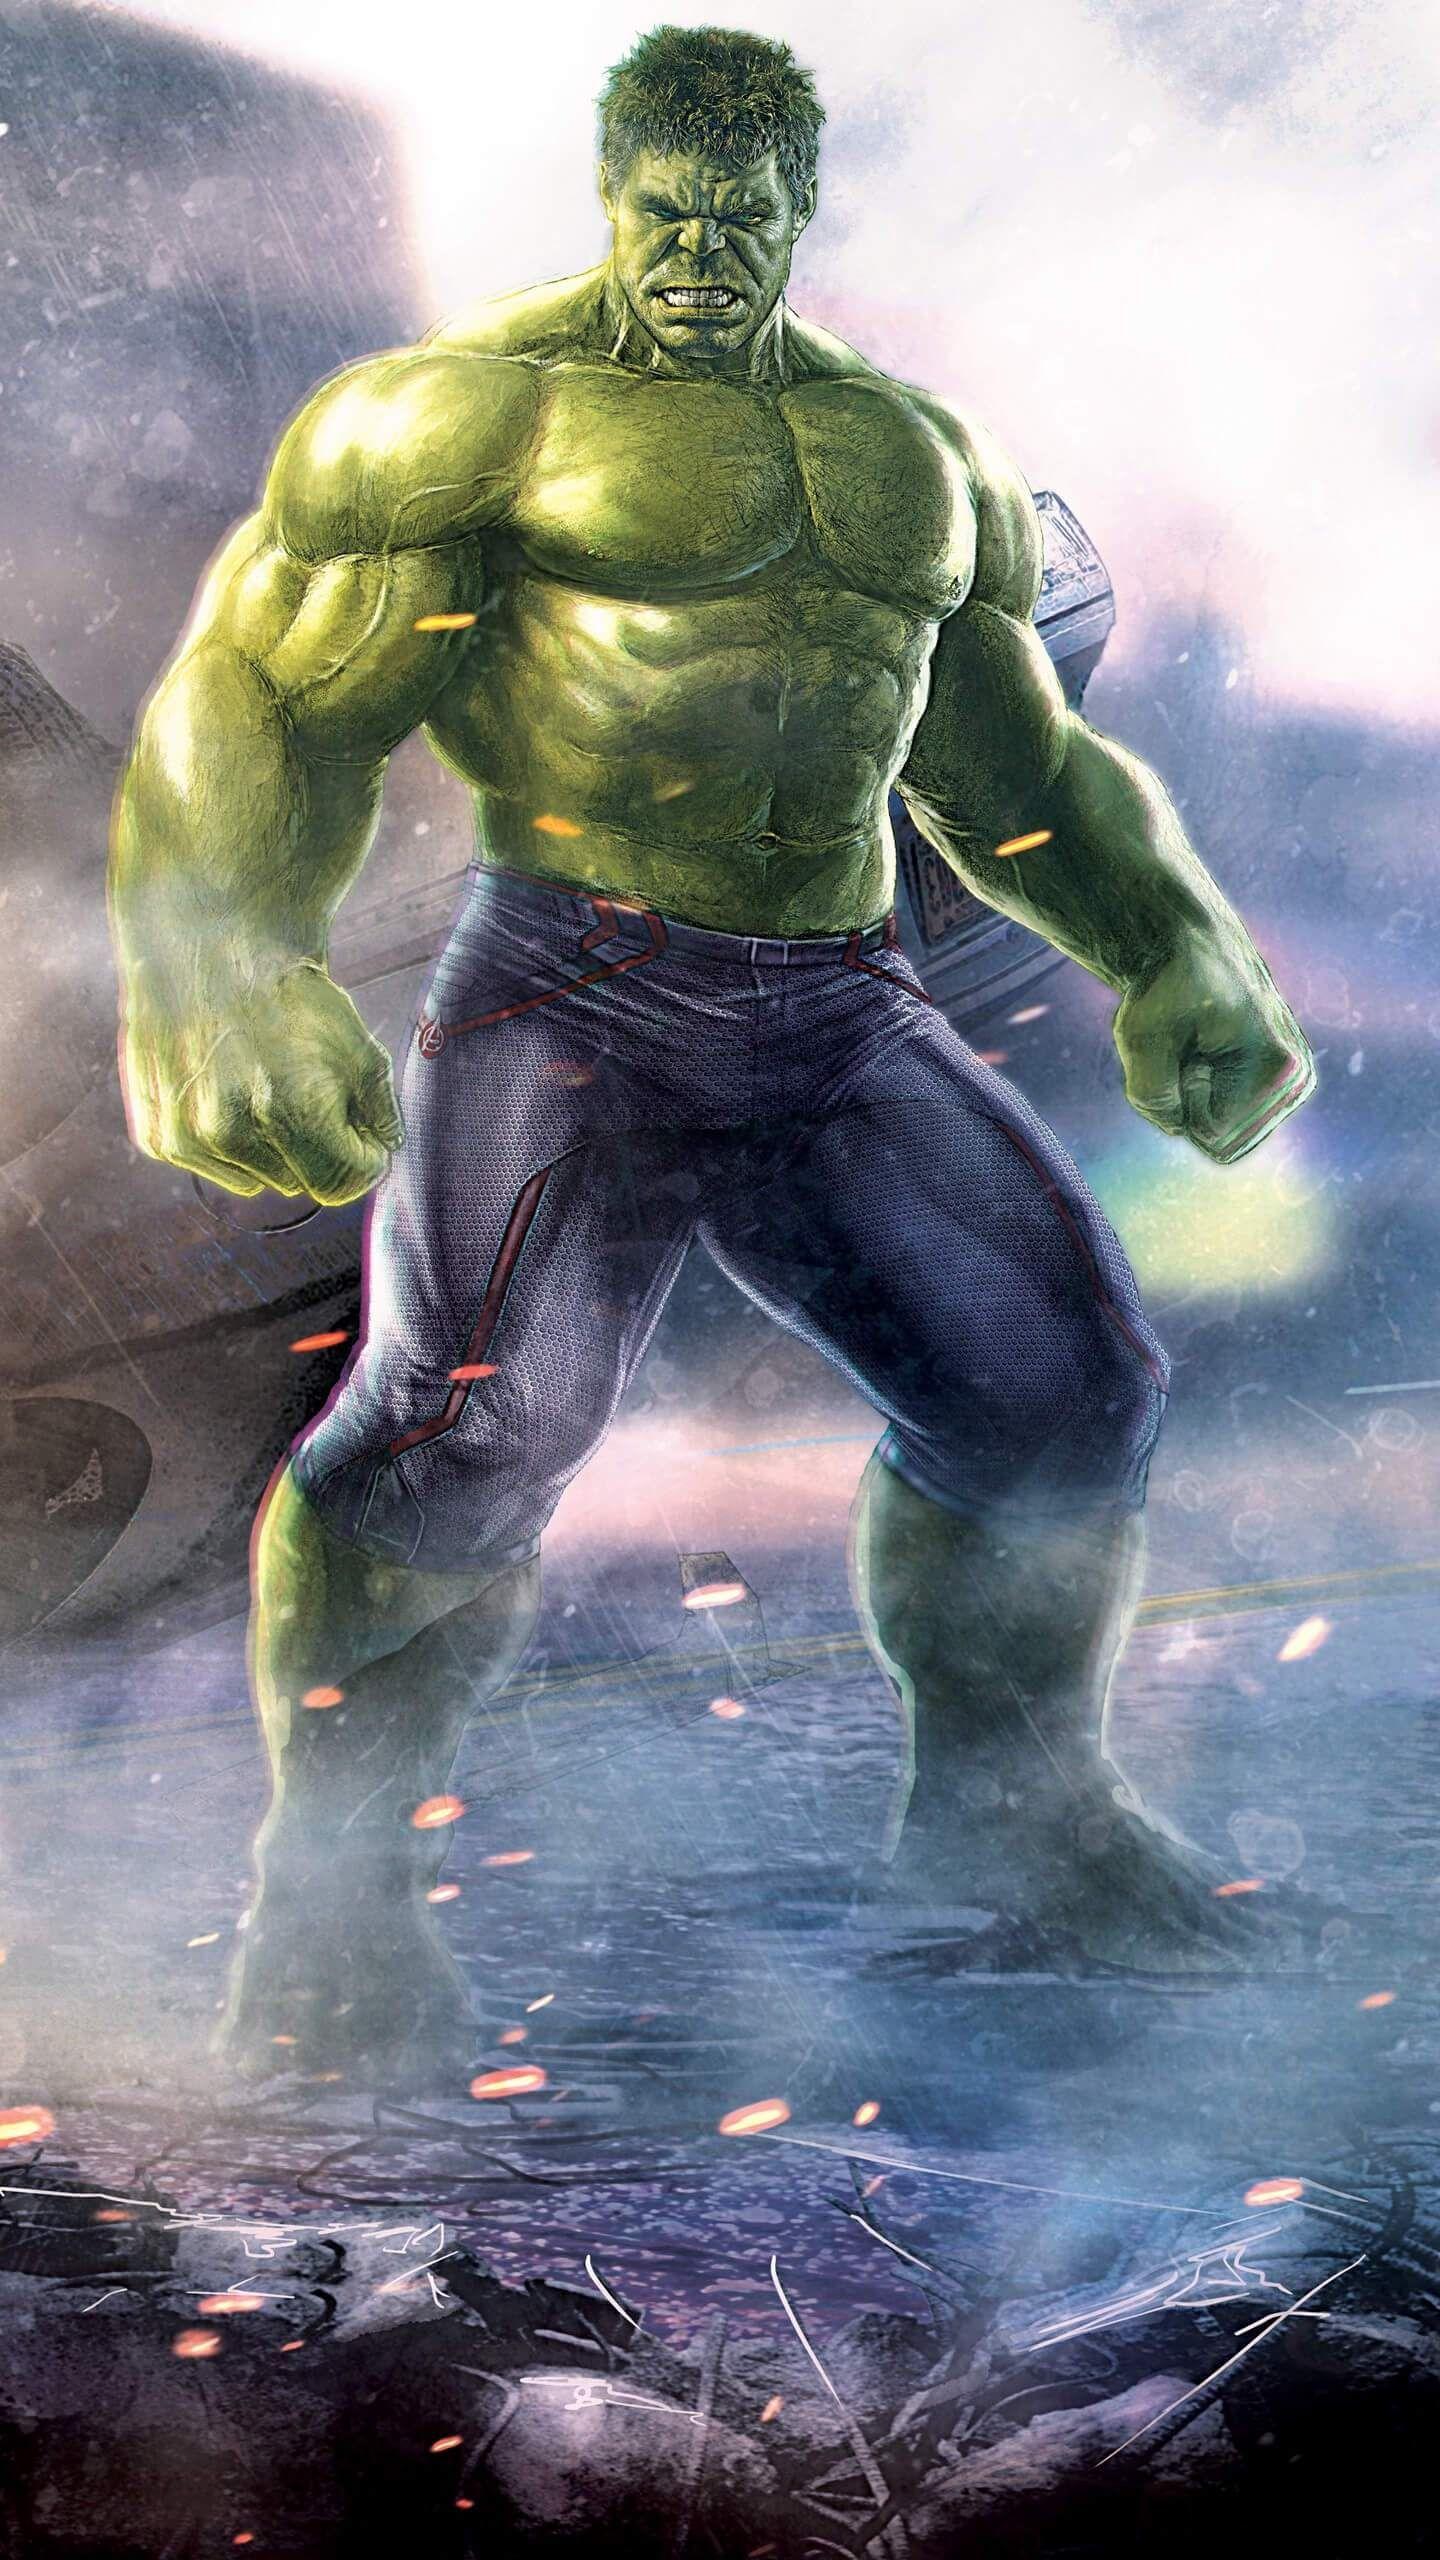 The Hulk Strongest Avenger iPhone Wallpaper (Dengan gambar)